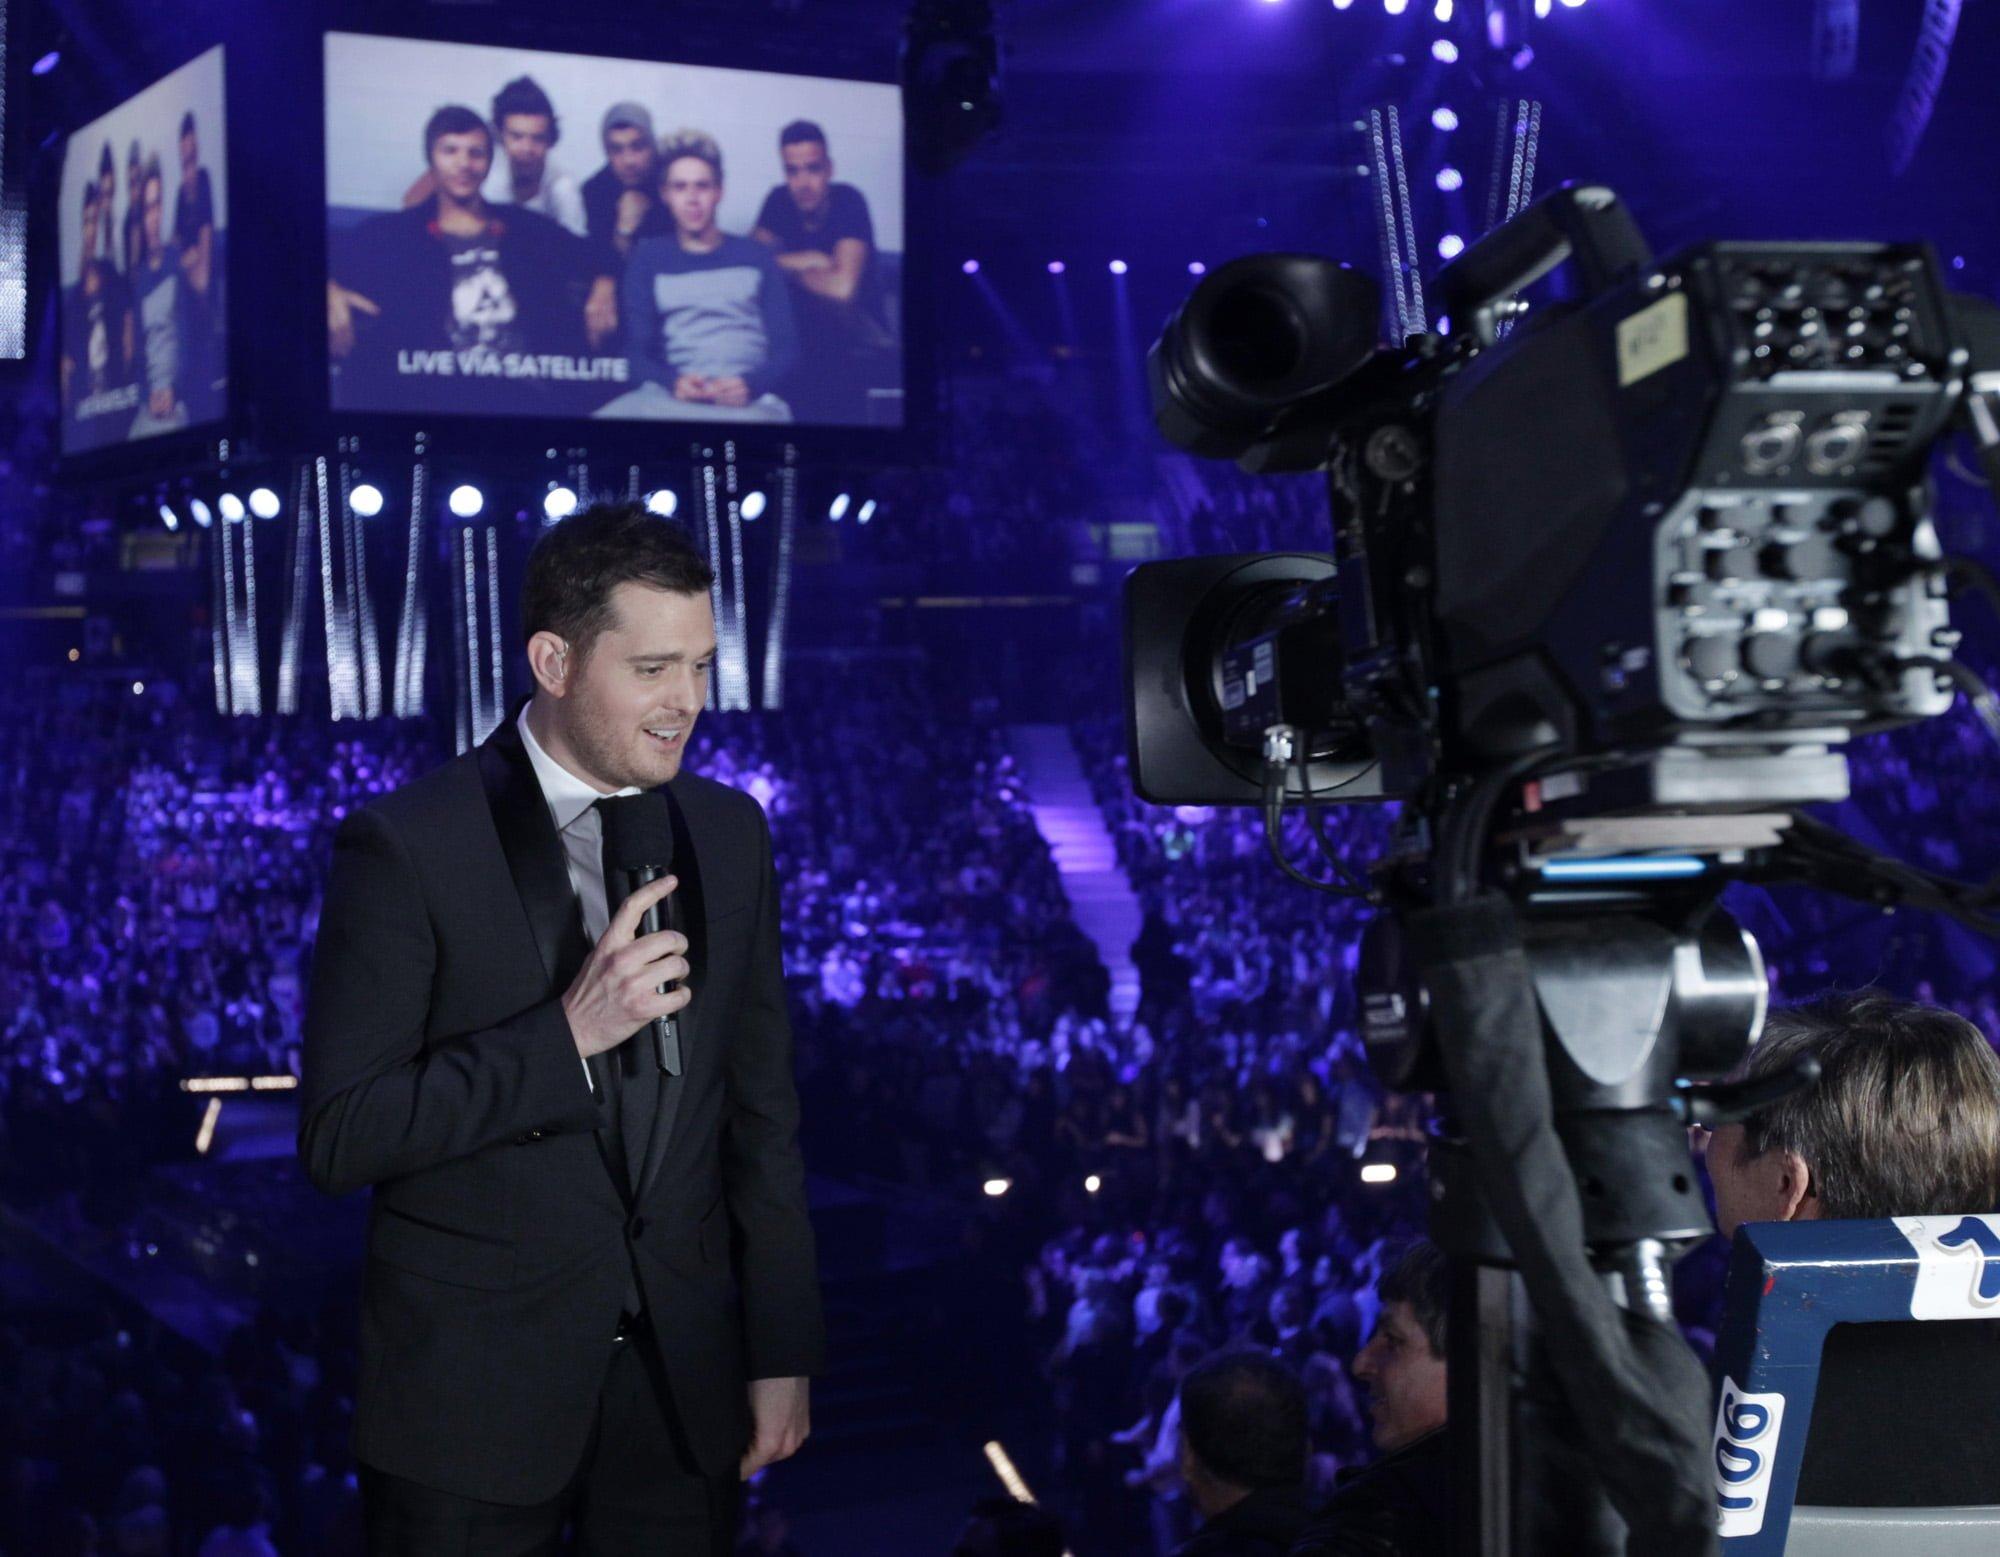 Host Michael Buble